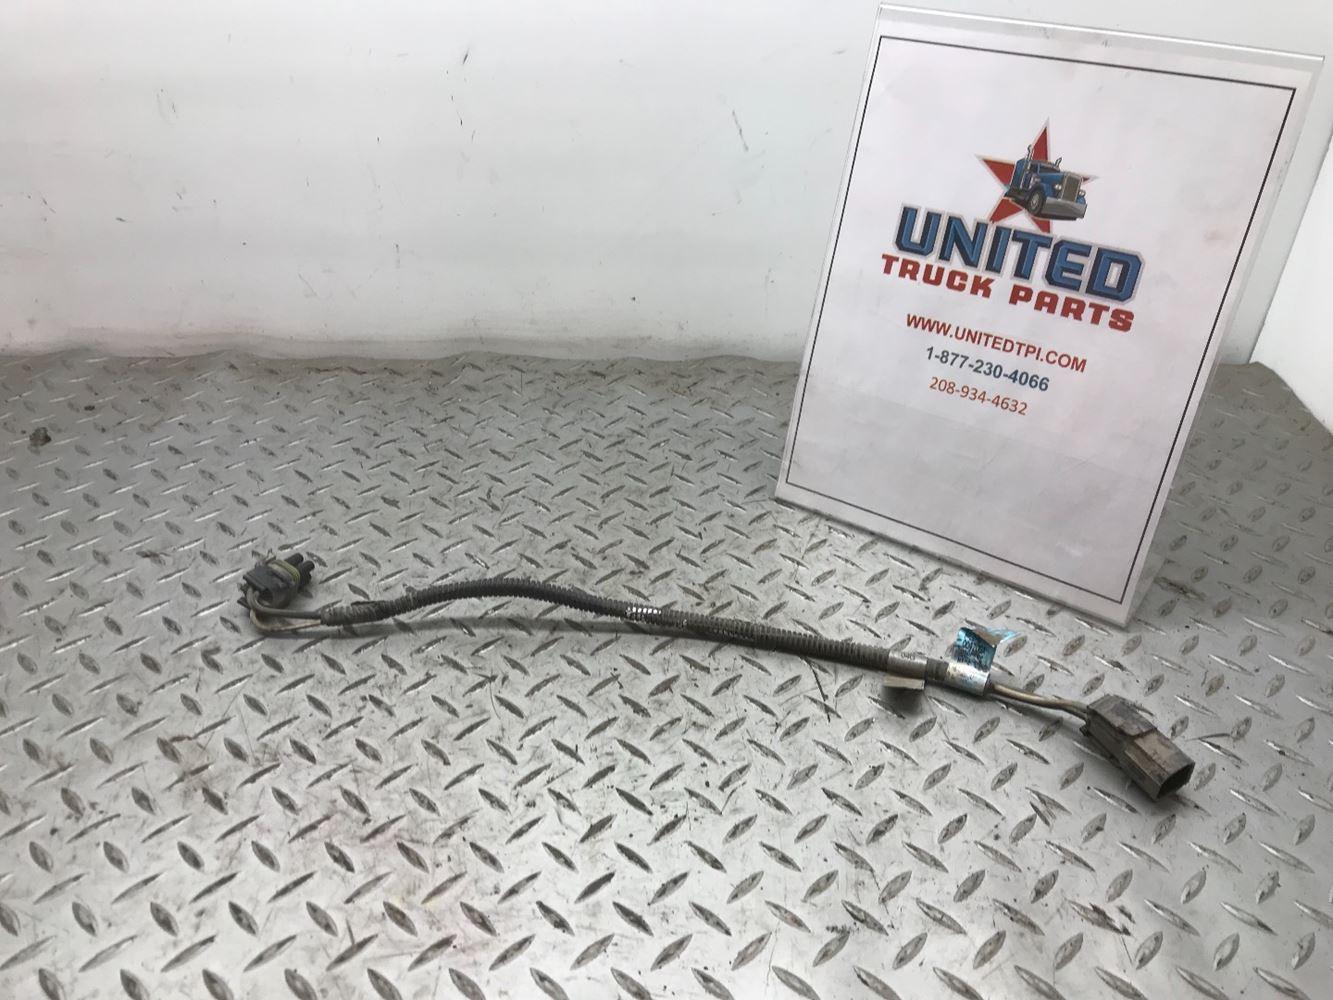 Cat 3306 Wiring Harness Diagram Harnesses United Truck Parts Inc Rh Unitedtpi Com 7rj05211 336